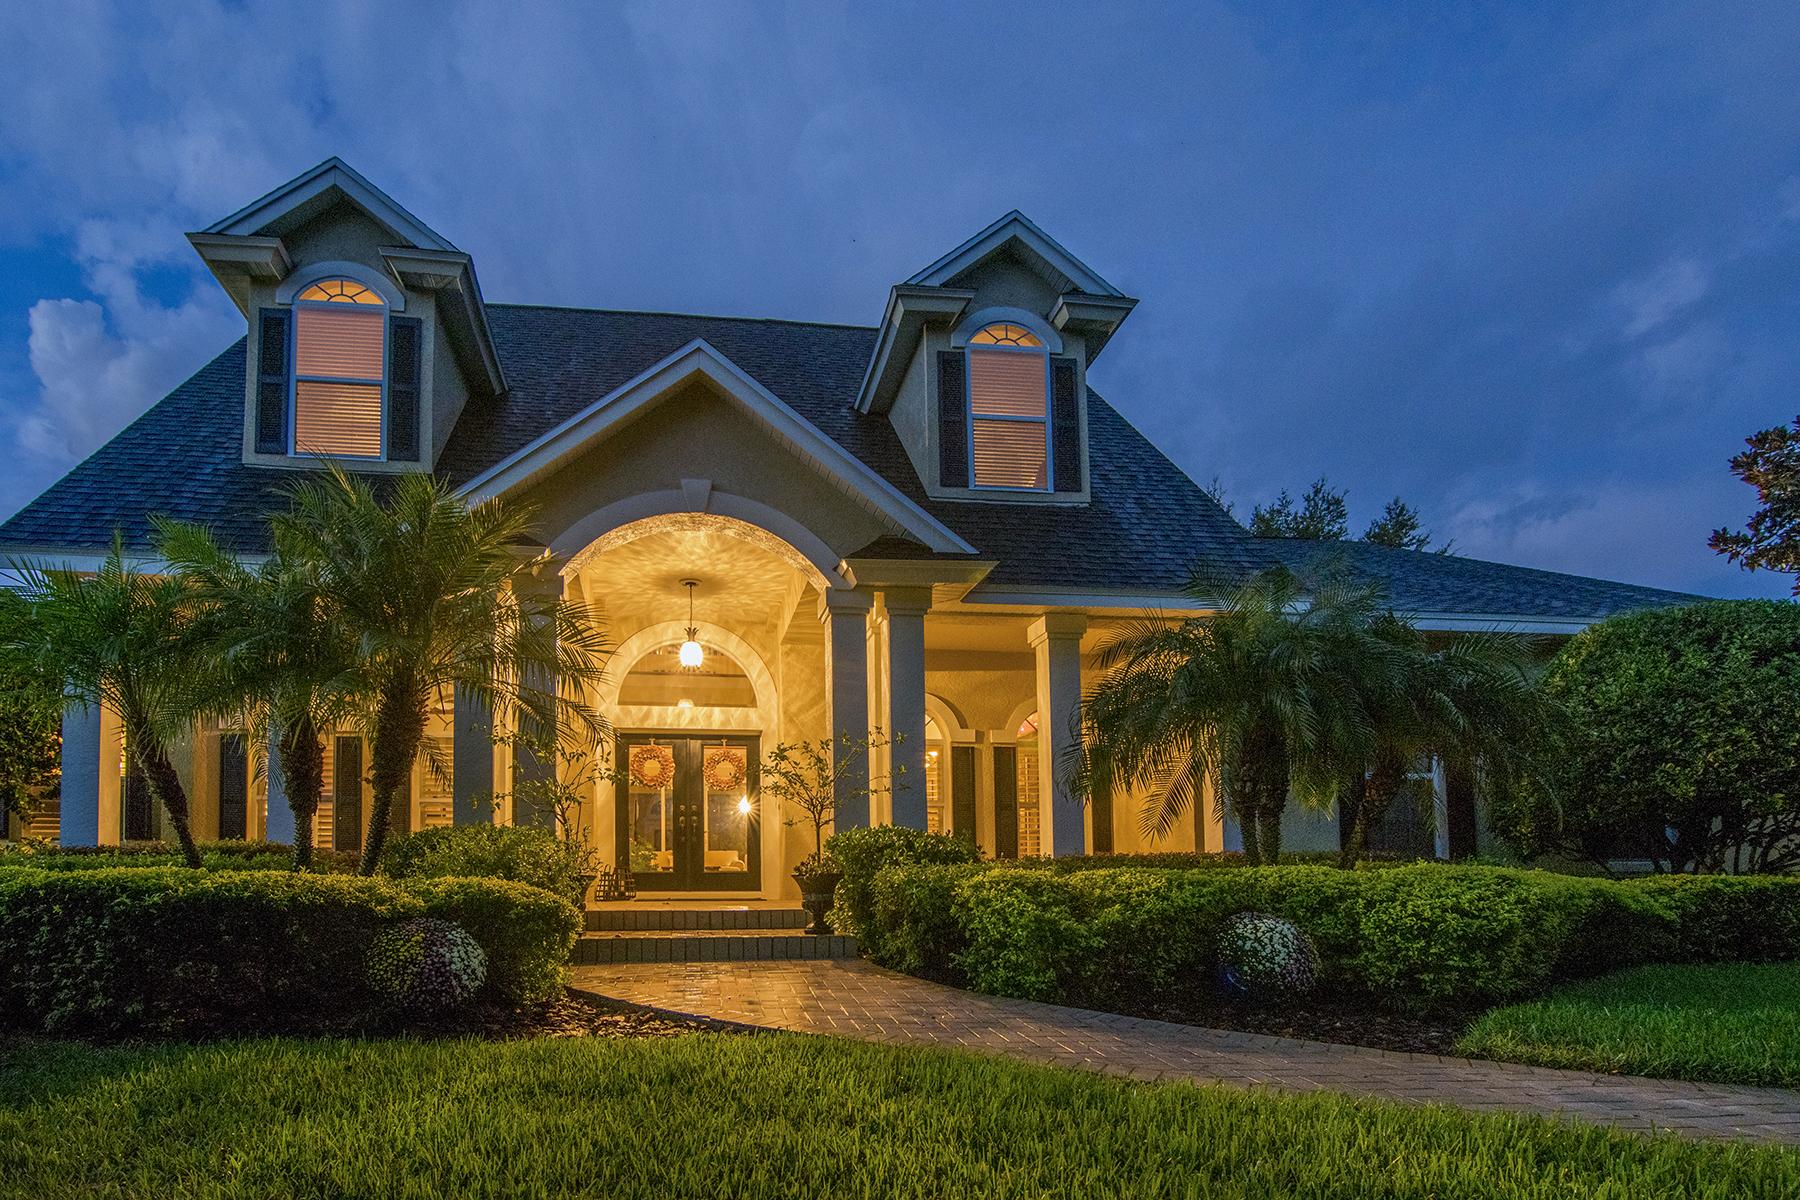 Single Family Home for Sale at VALRICO 5204 Culasaja Cir Valrico, Florida, 33596 United States